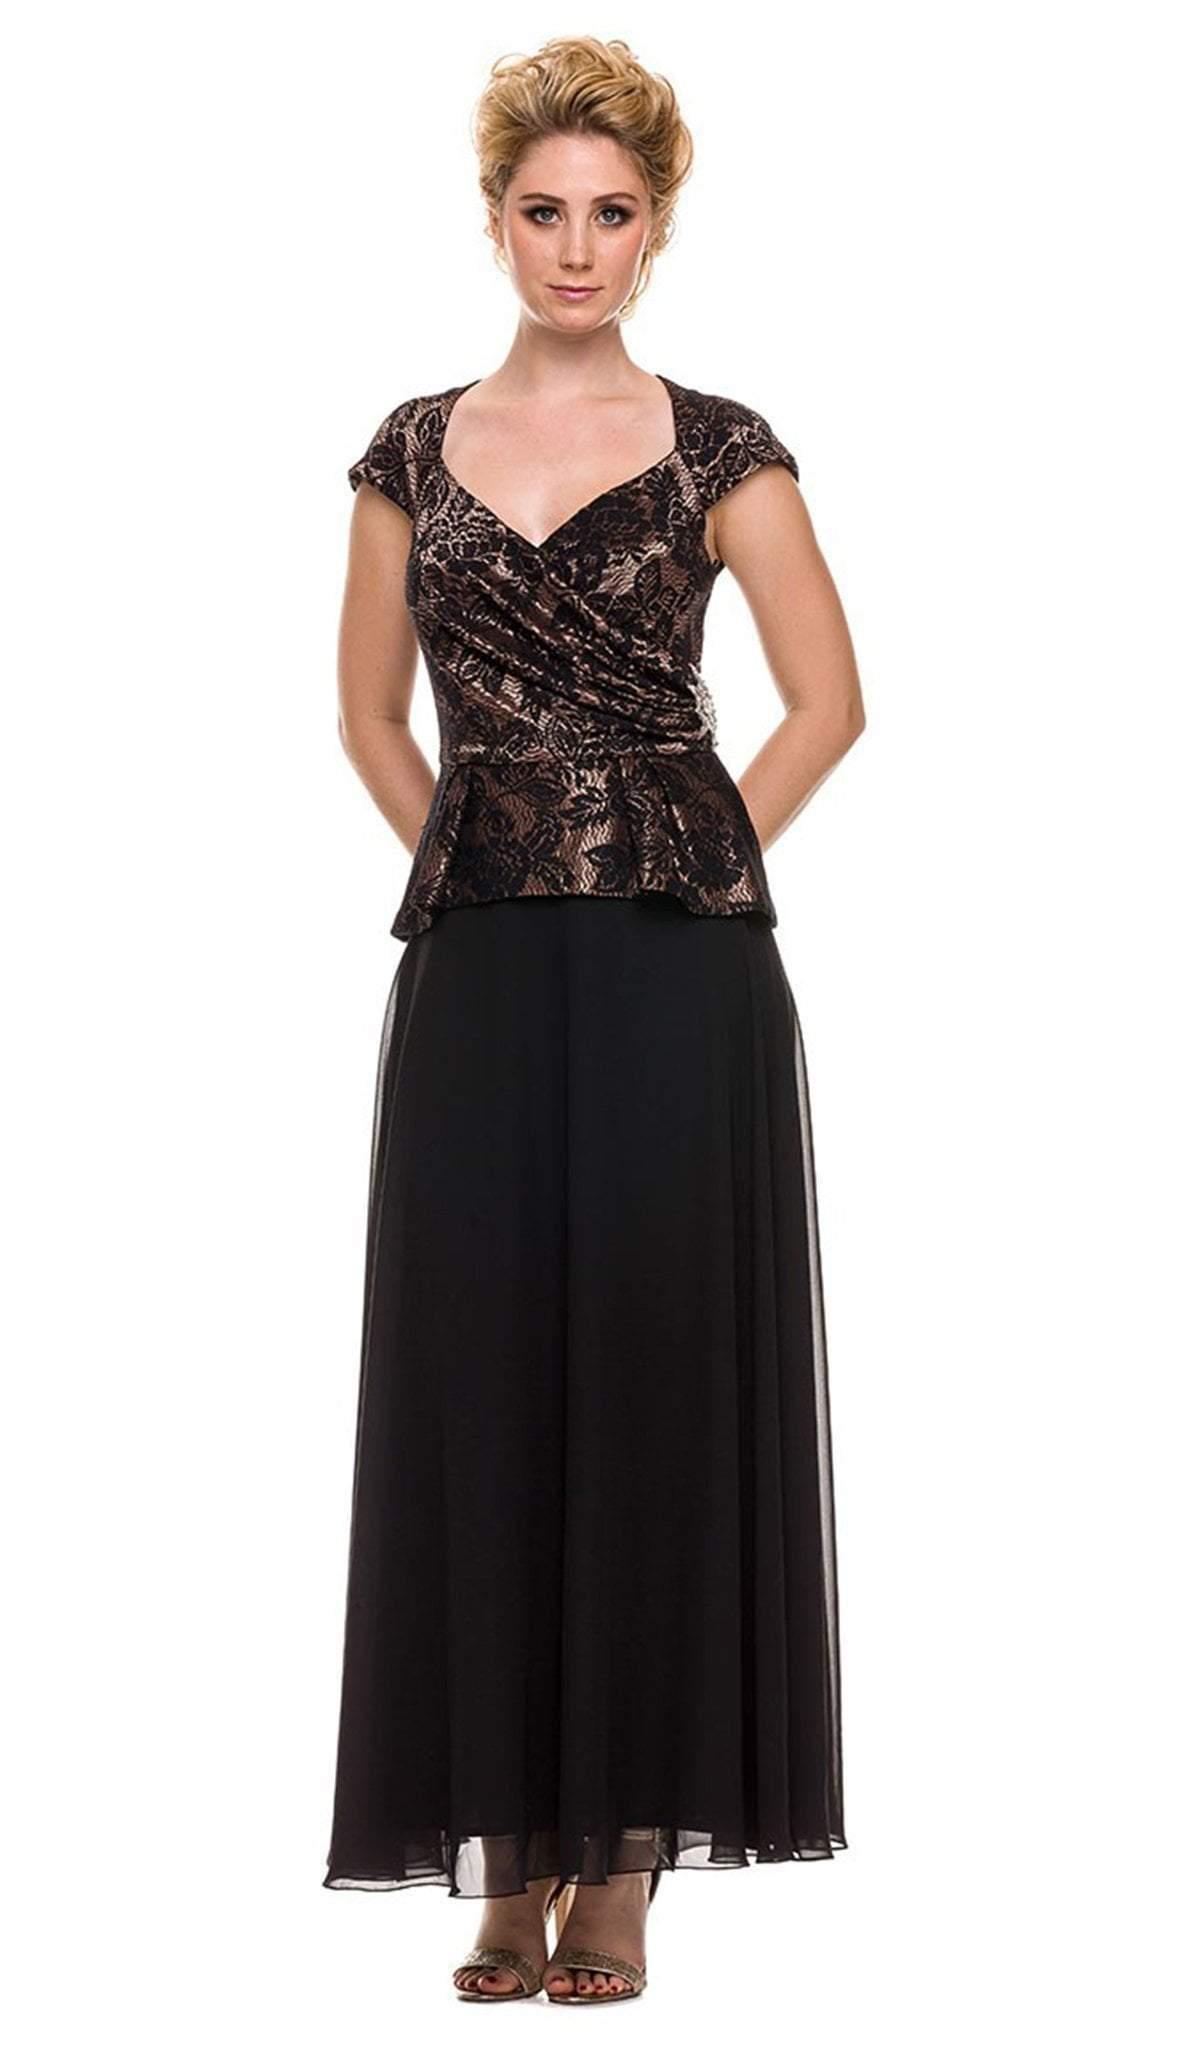 Nox Anabel - 5102 Lace Cap Sleeve Dress